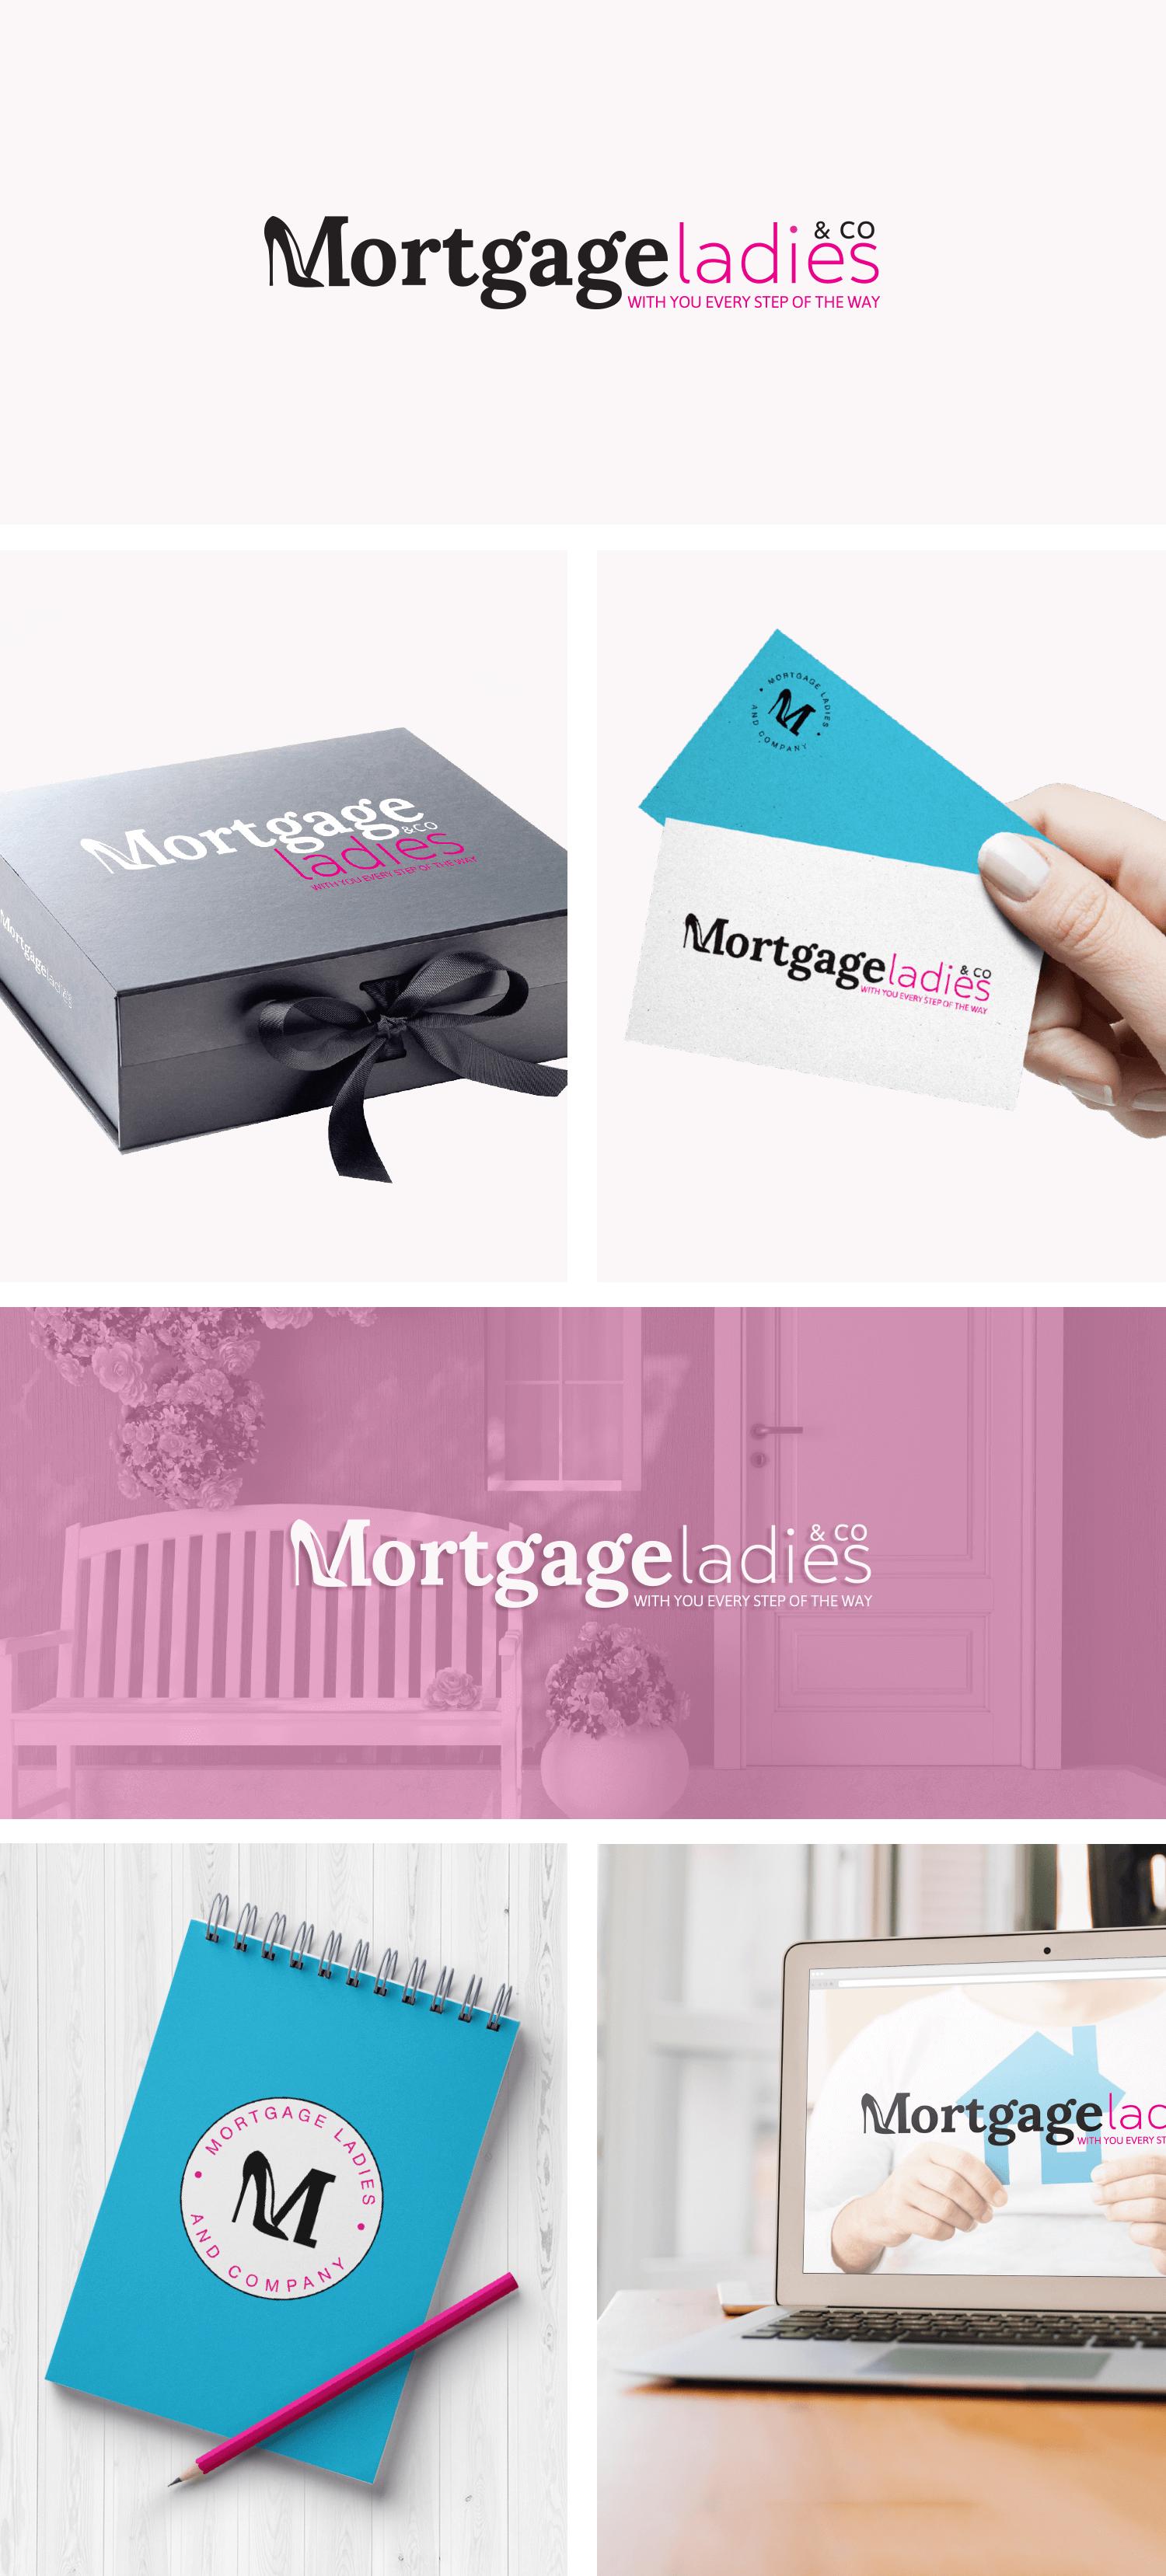 Mortgage-ladiesbranding-show-case.png